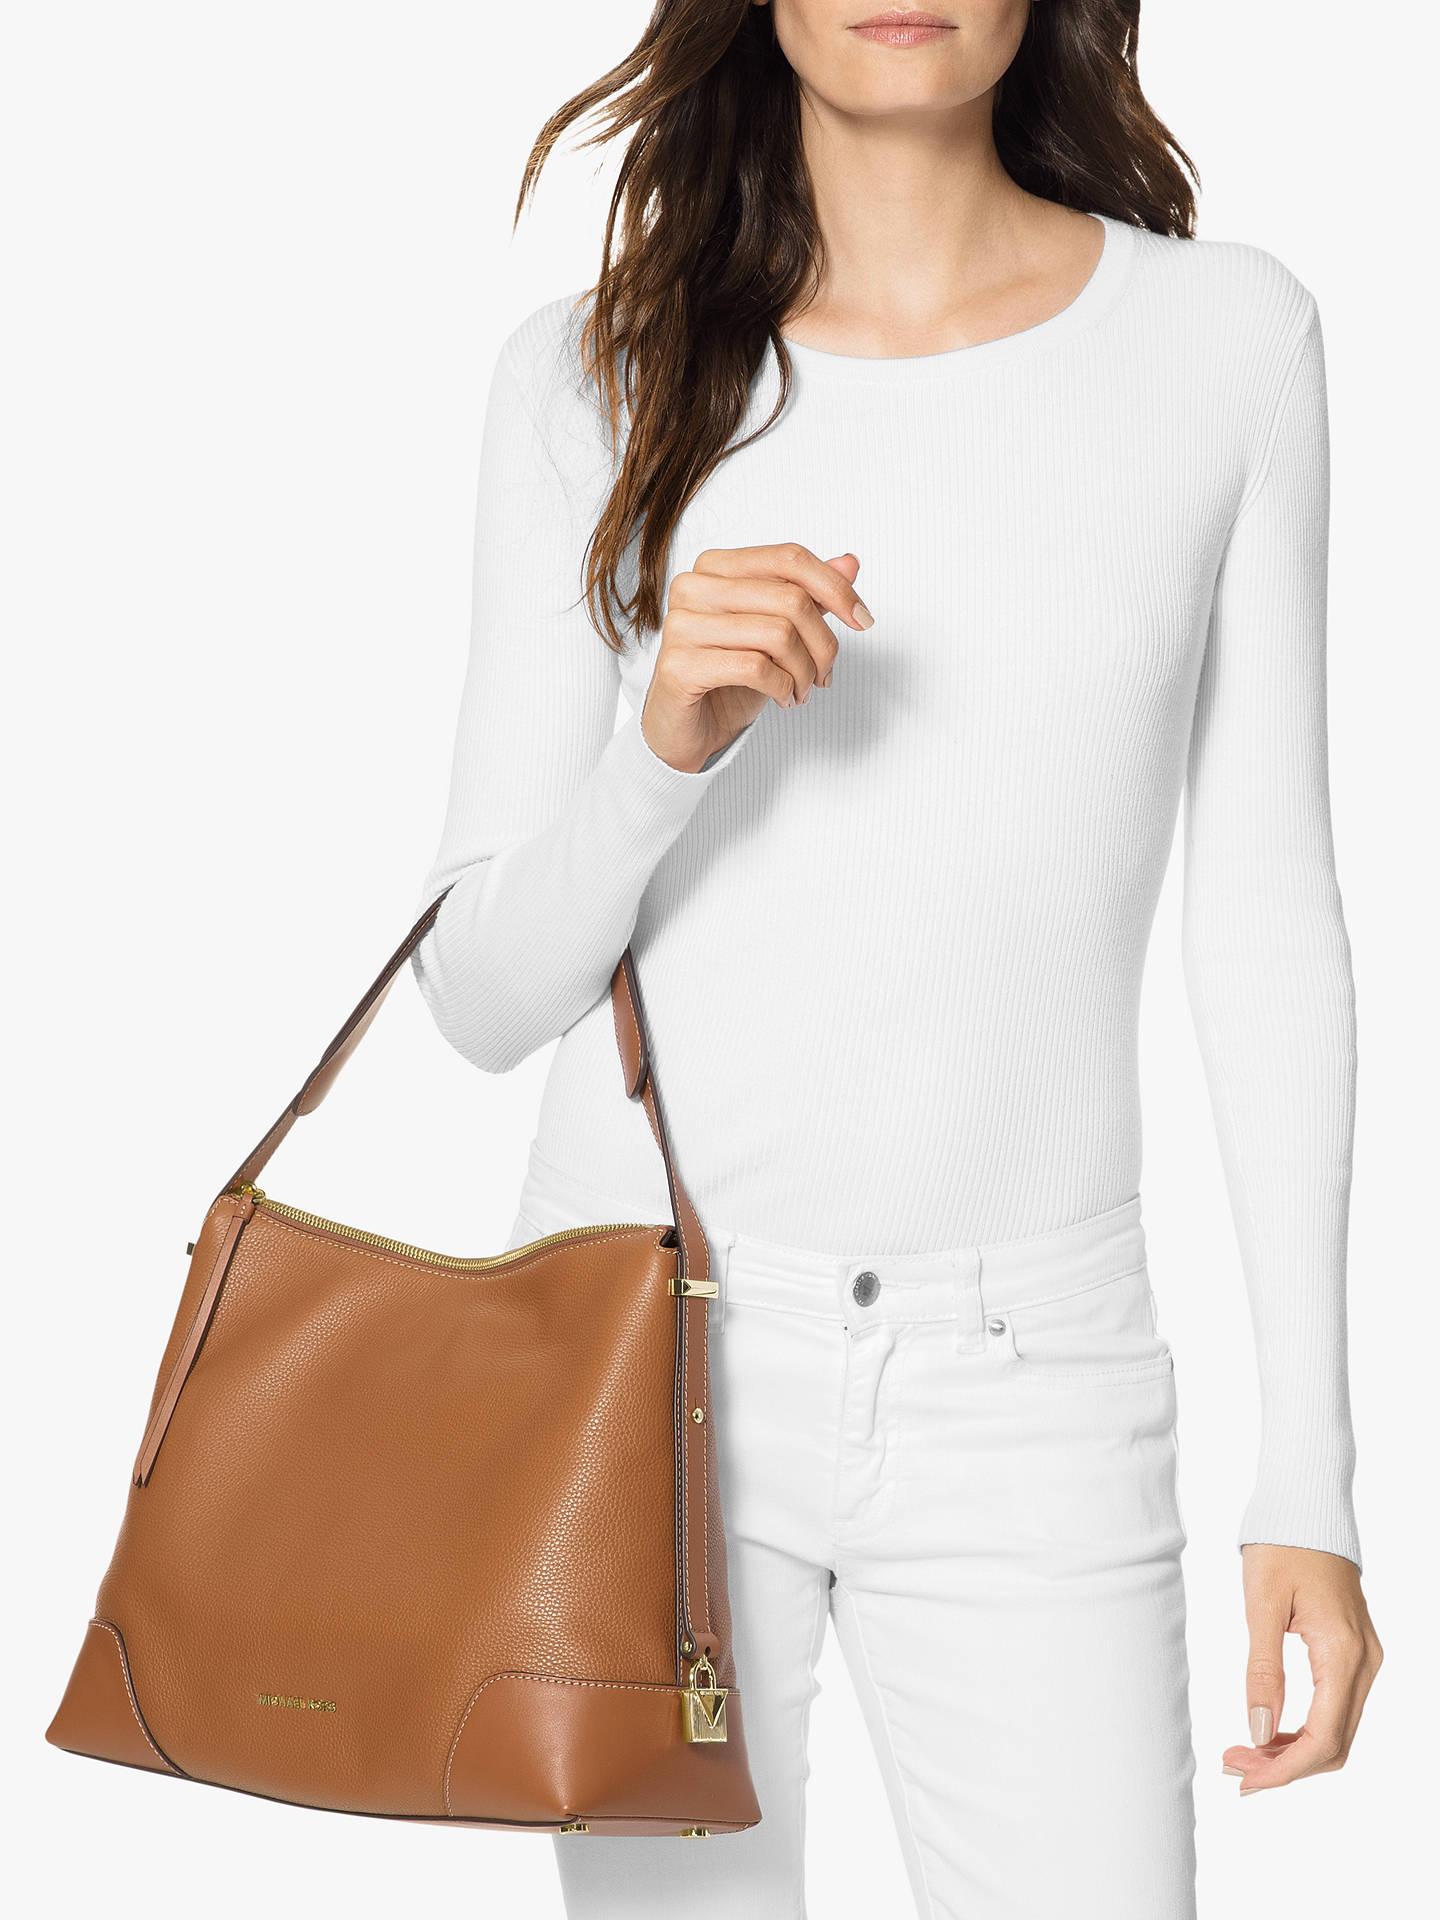 353d22231e41 MICHAEL Michael Kors Crosby Large Leather Shoulder Bag at John Lewis ...